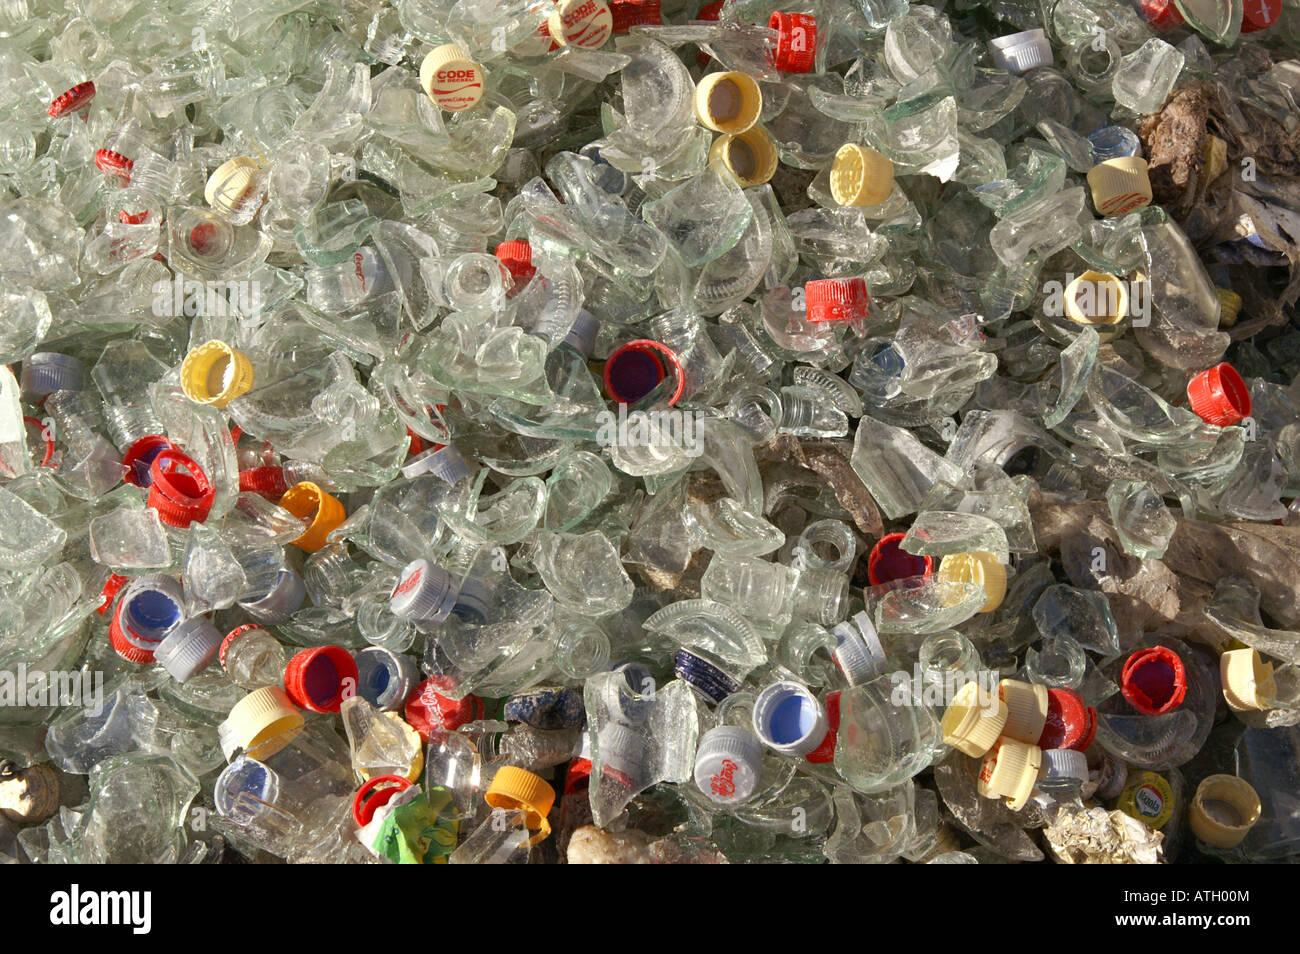 Bulk Recycled Glass